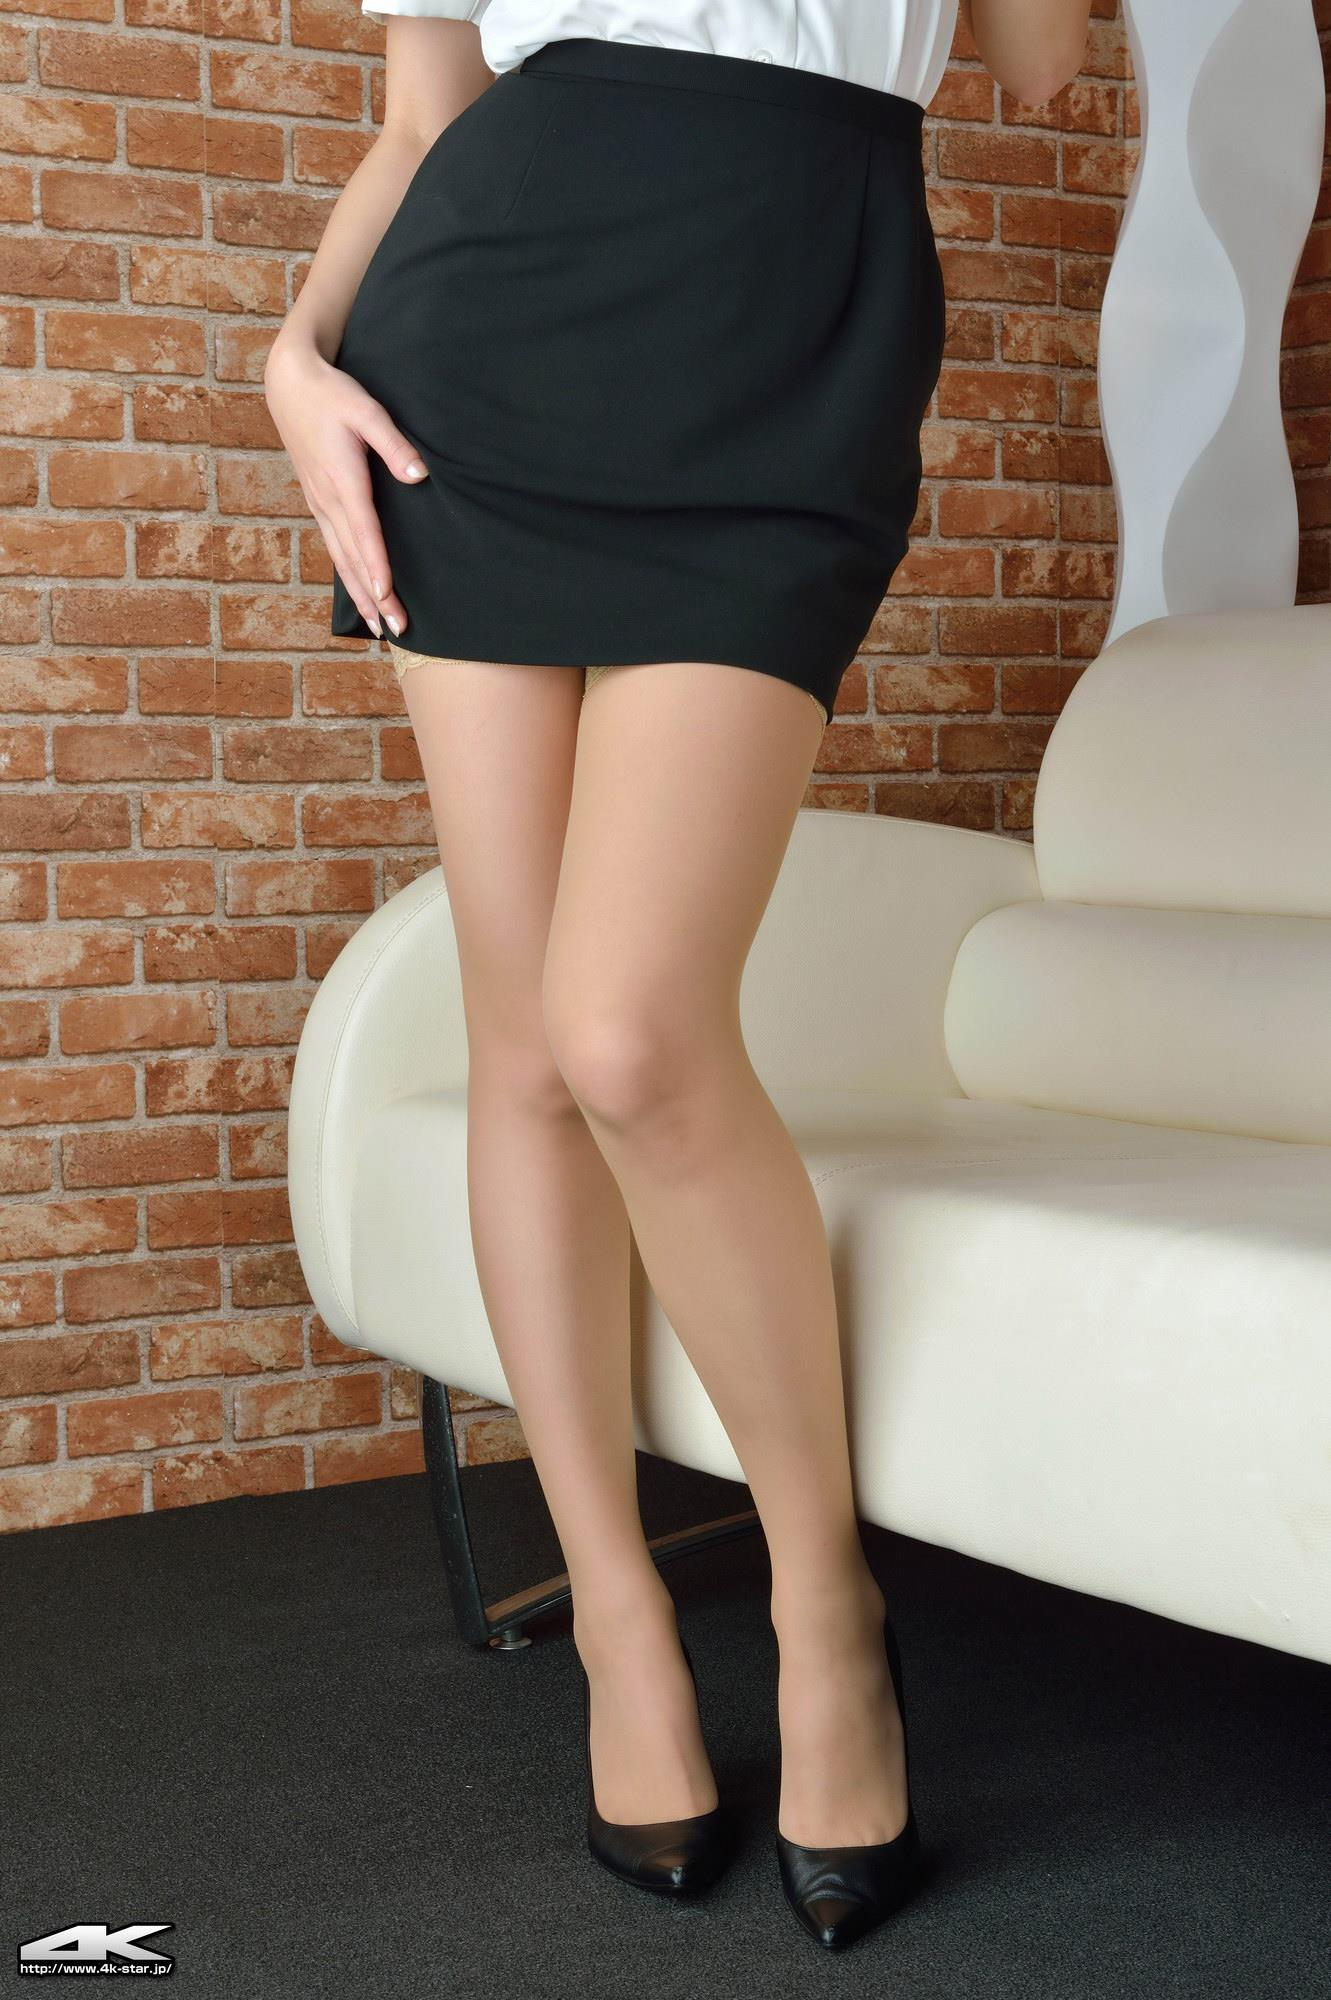 [4K-STAR套图]No.00113 吉川さおり(吉见早央 , Sao Yoshimi) 性感女秘书制服与肉色丝袜美腿加粉色内衣私房写真集